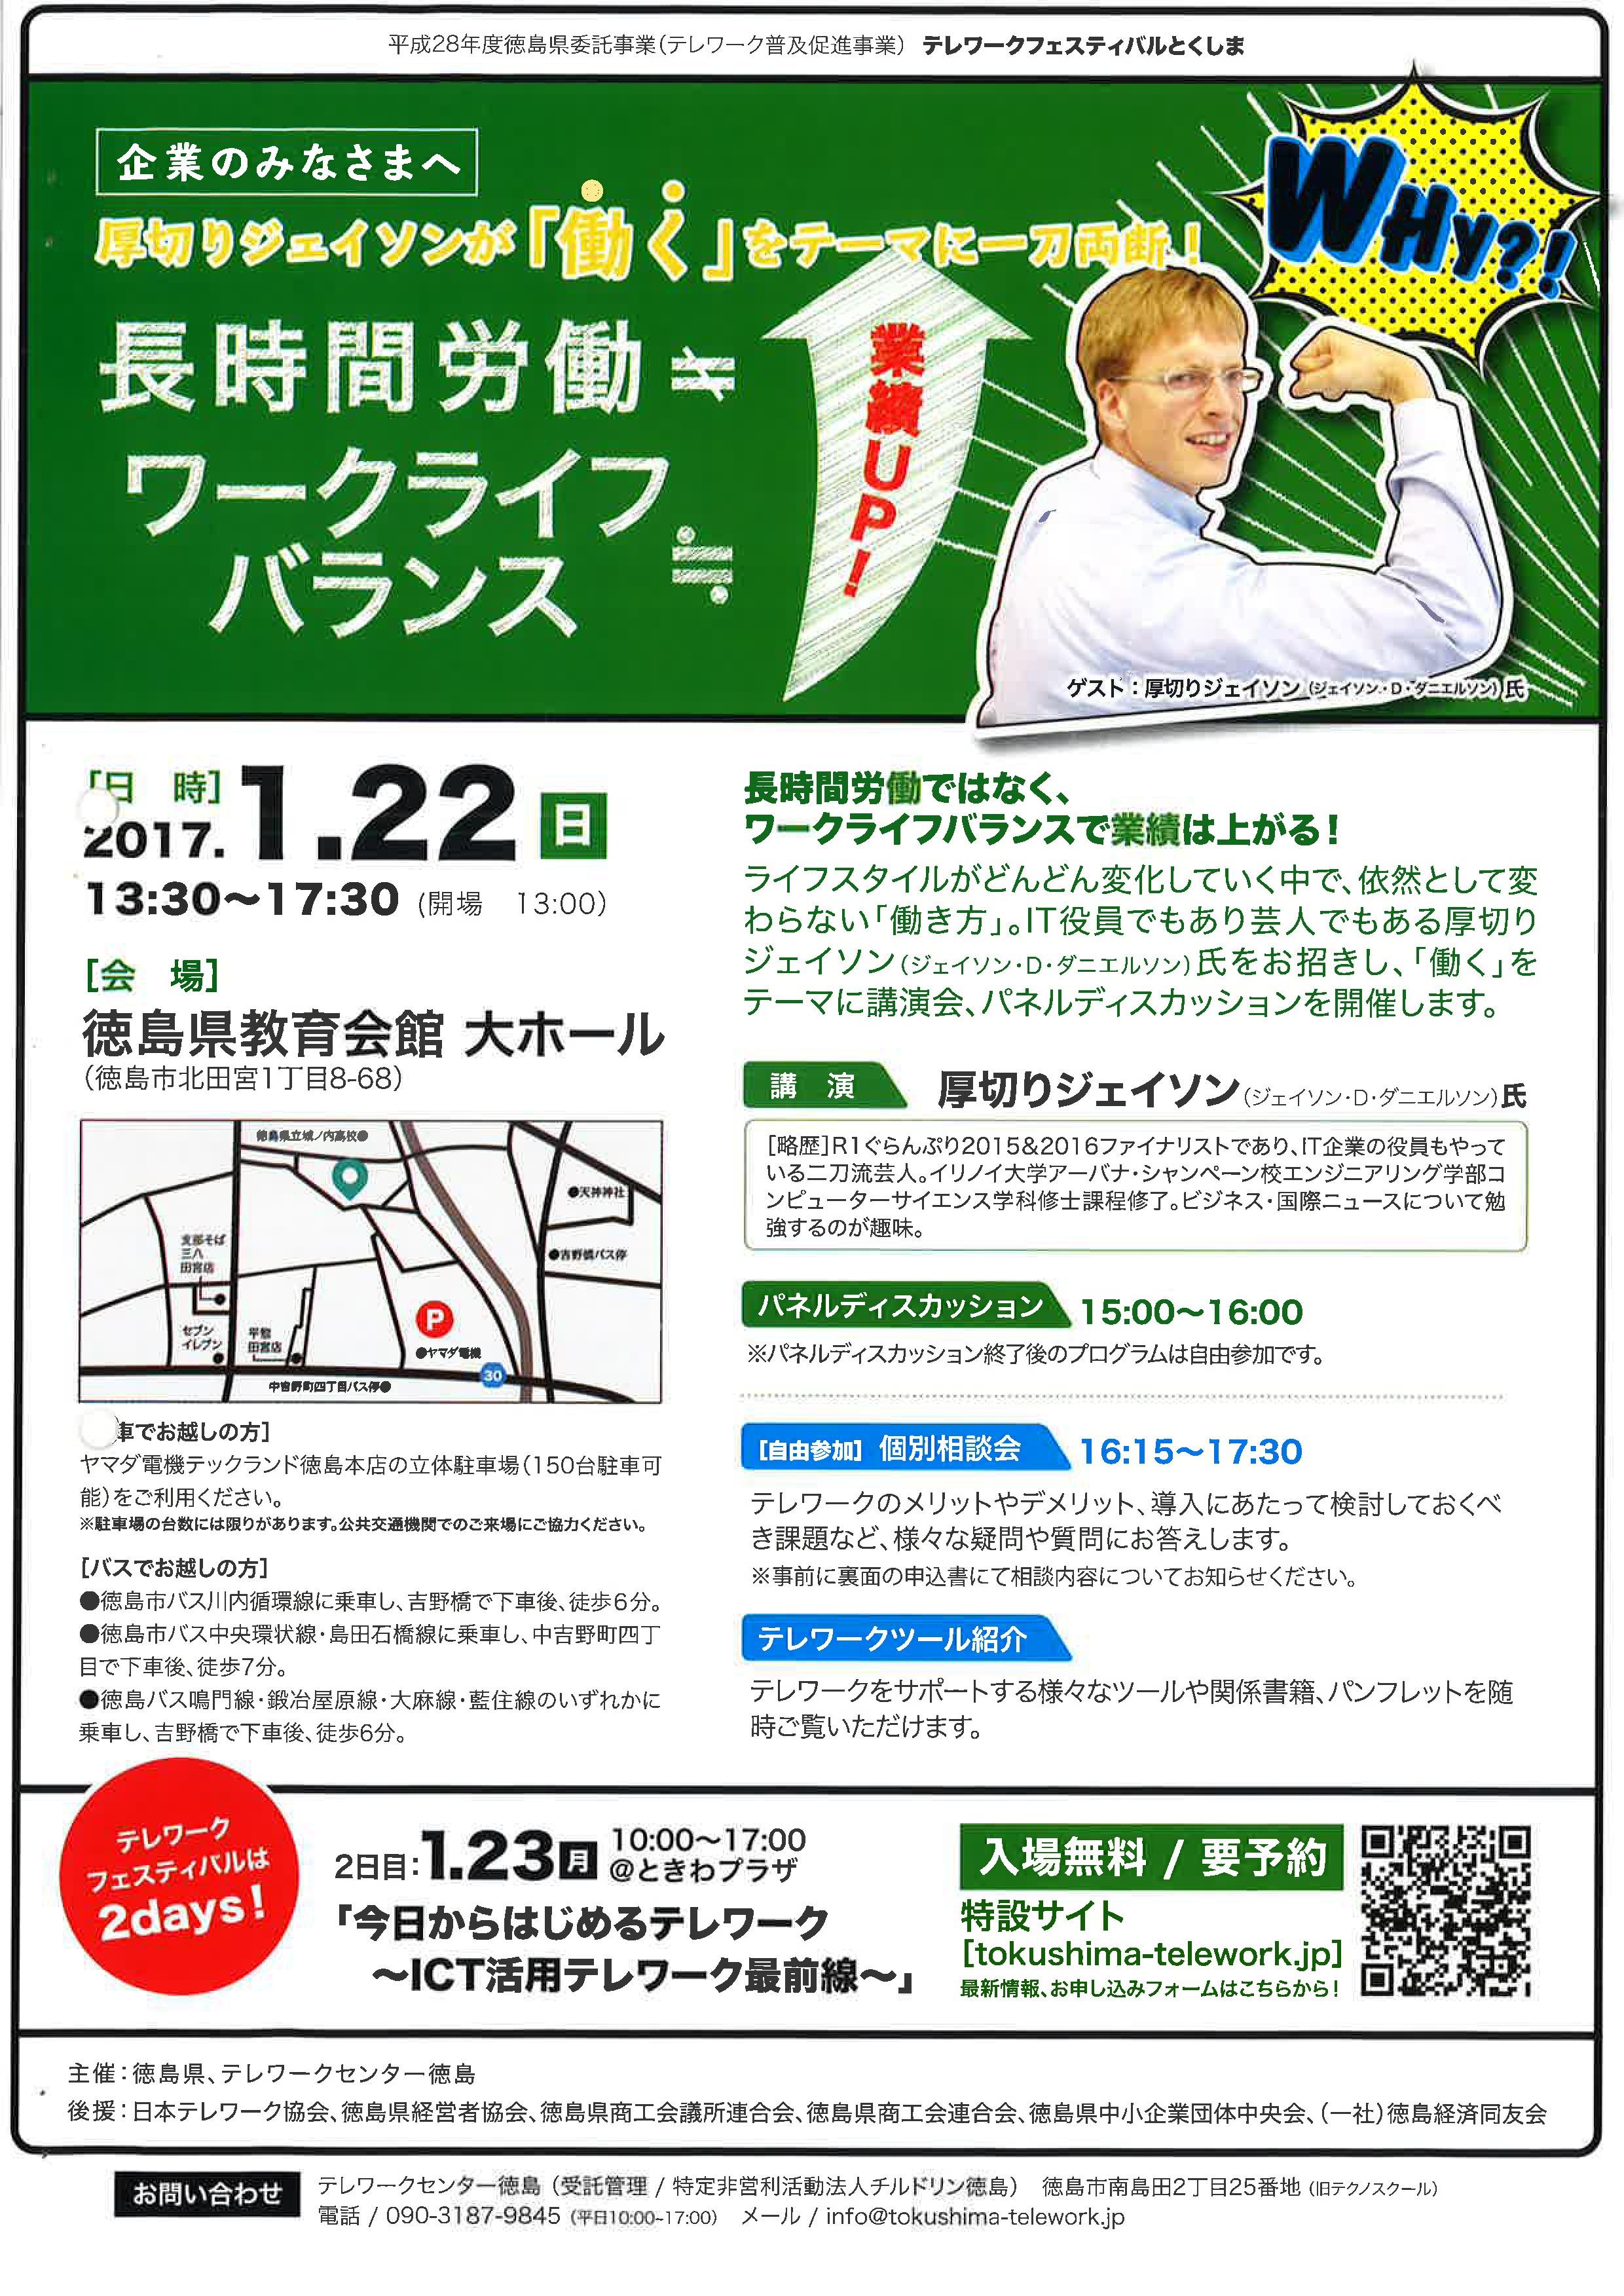 20161221093116-001